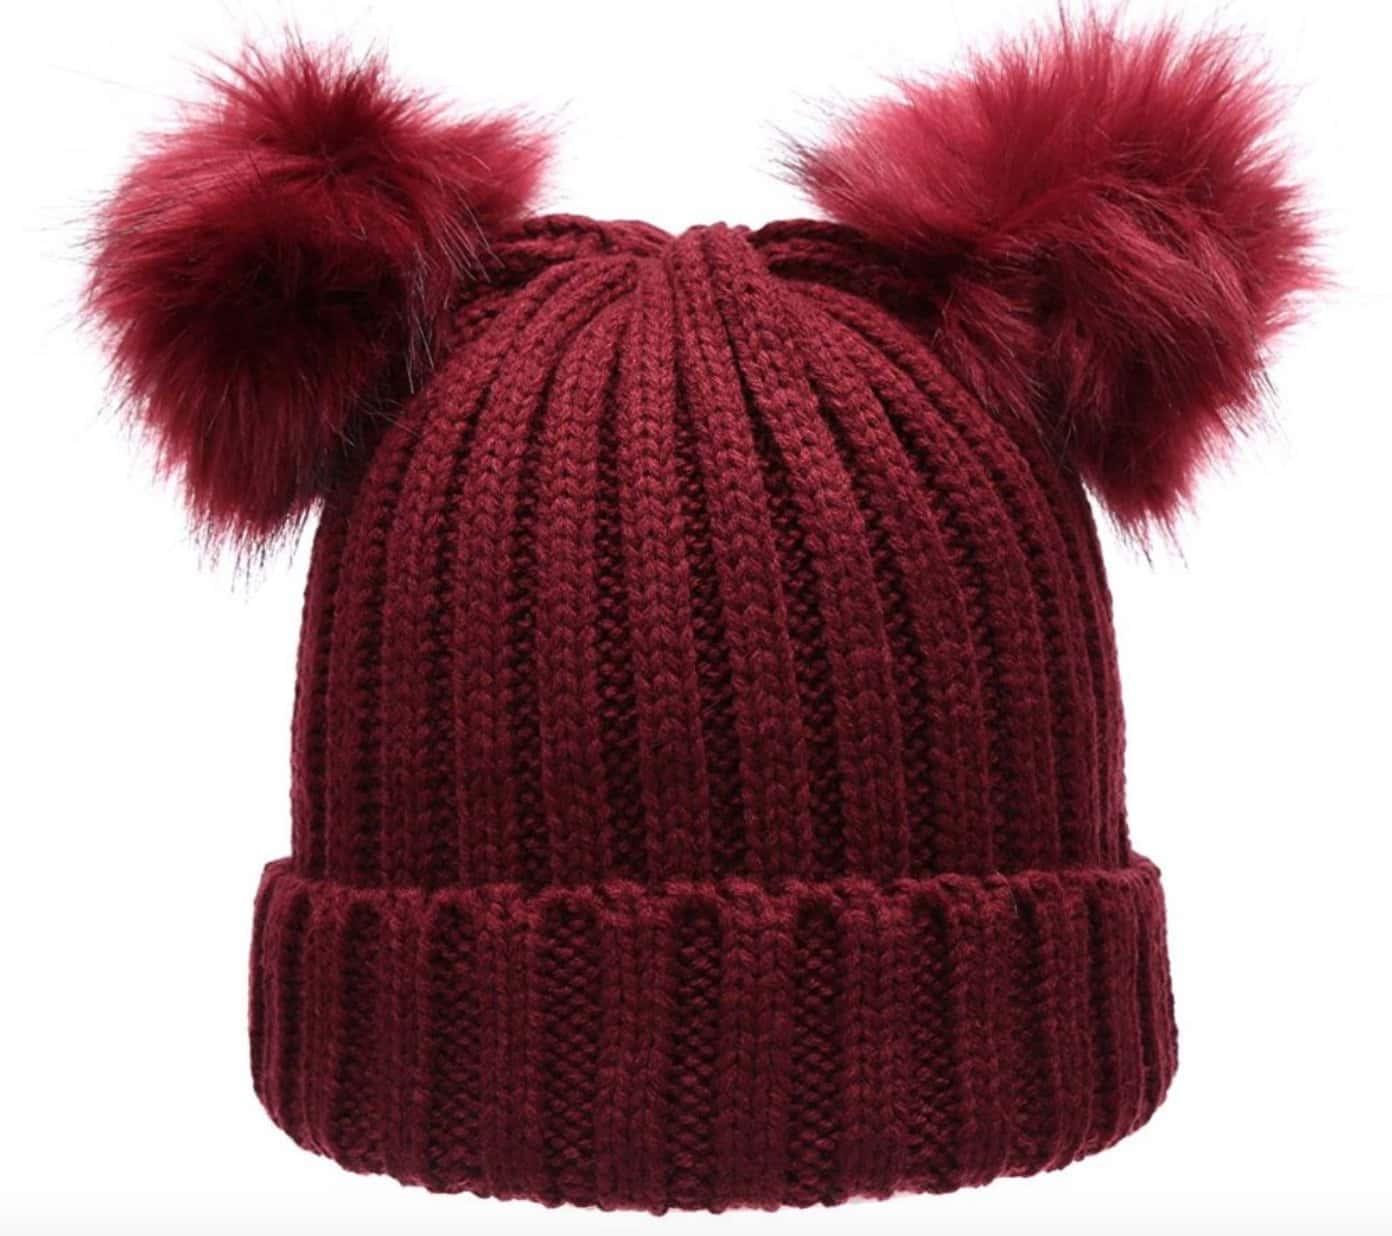 Kış Şapkası Ponponu